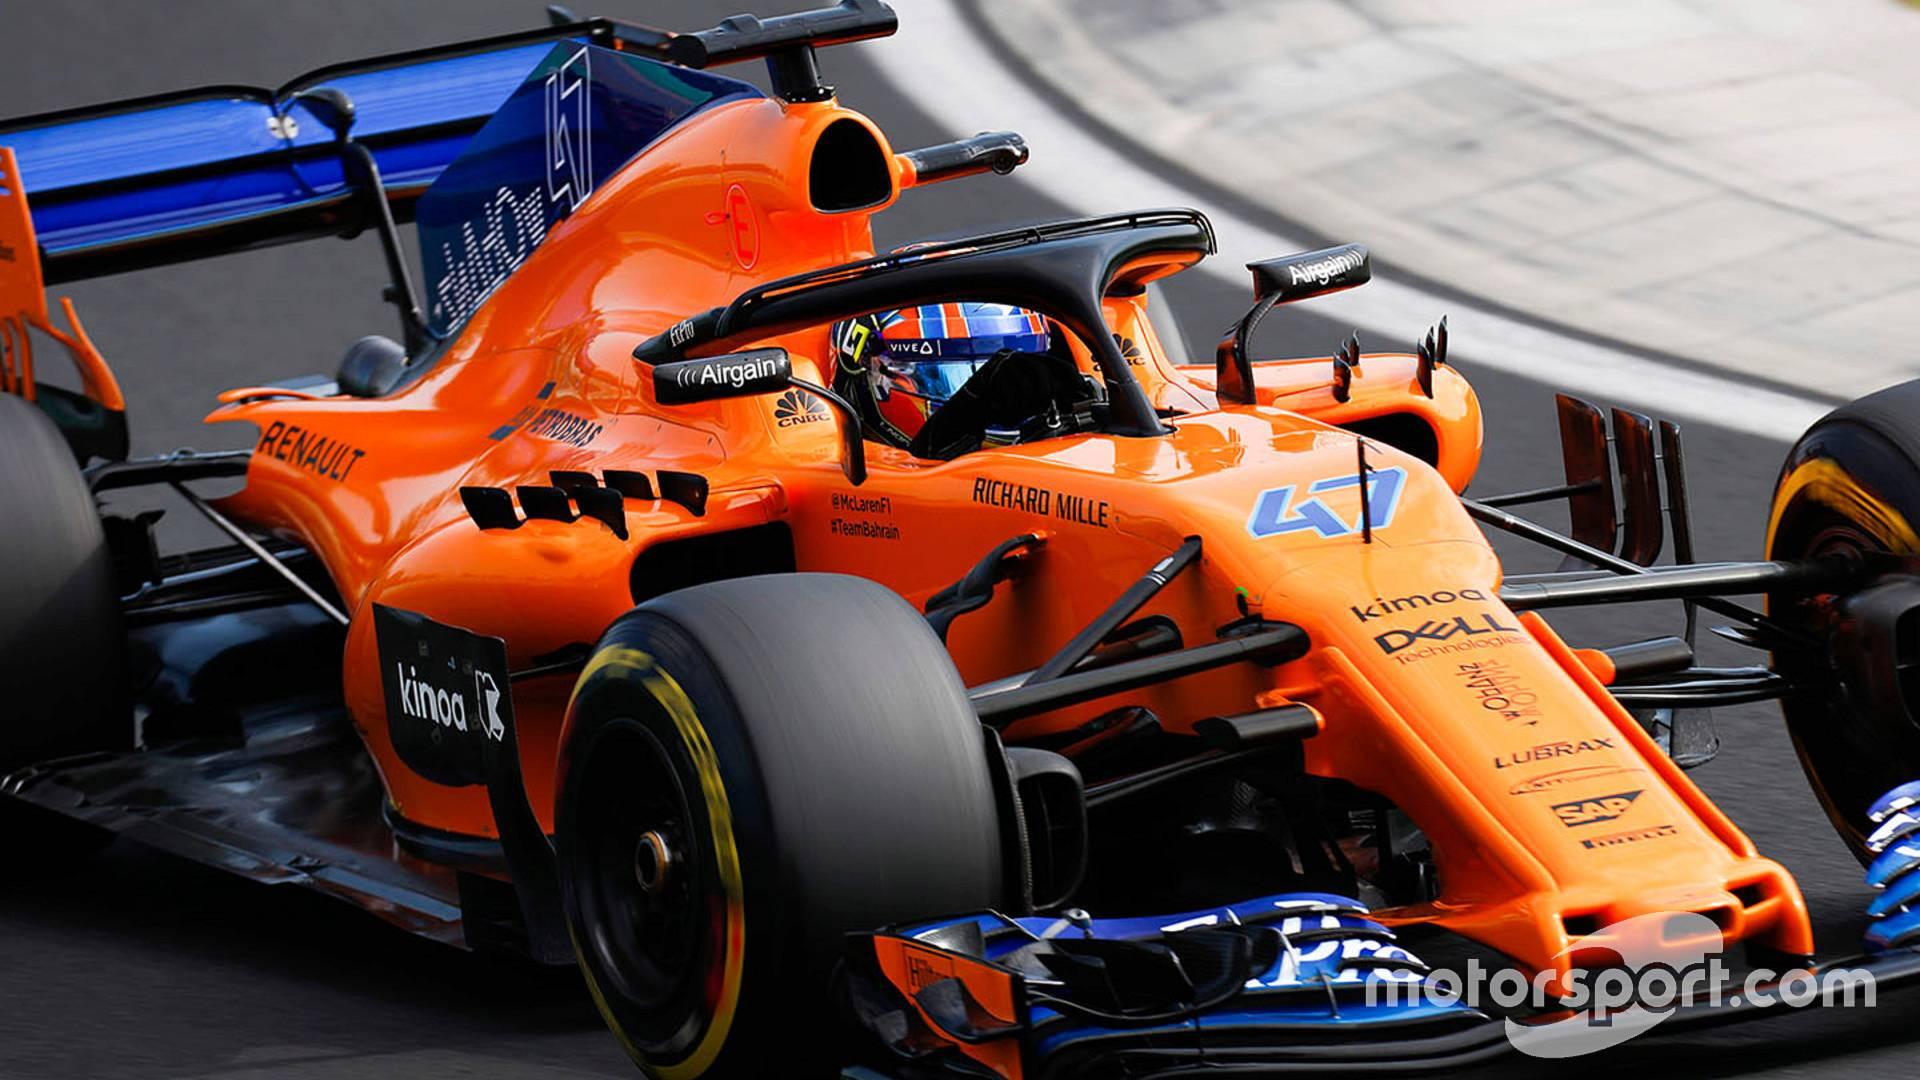 McLaren reserve driver Norris to make FP1 debut at Spa 1920x1080